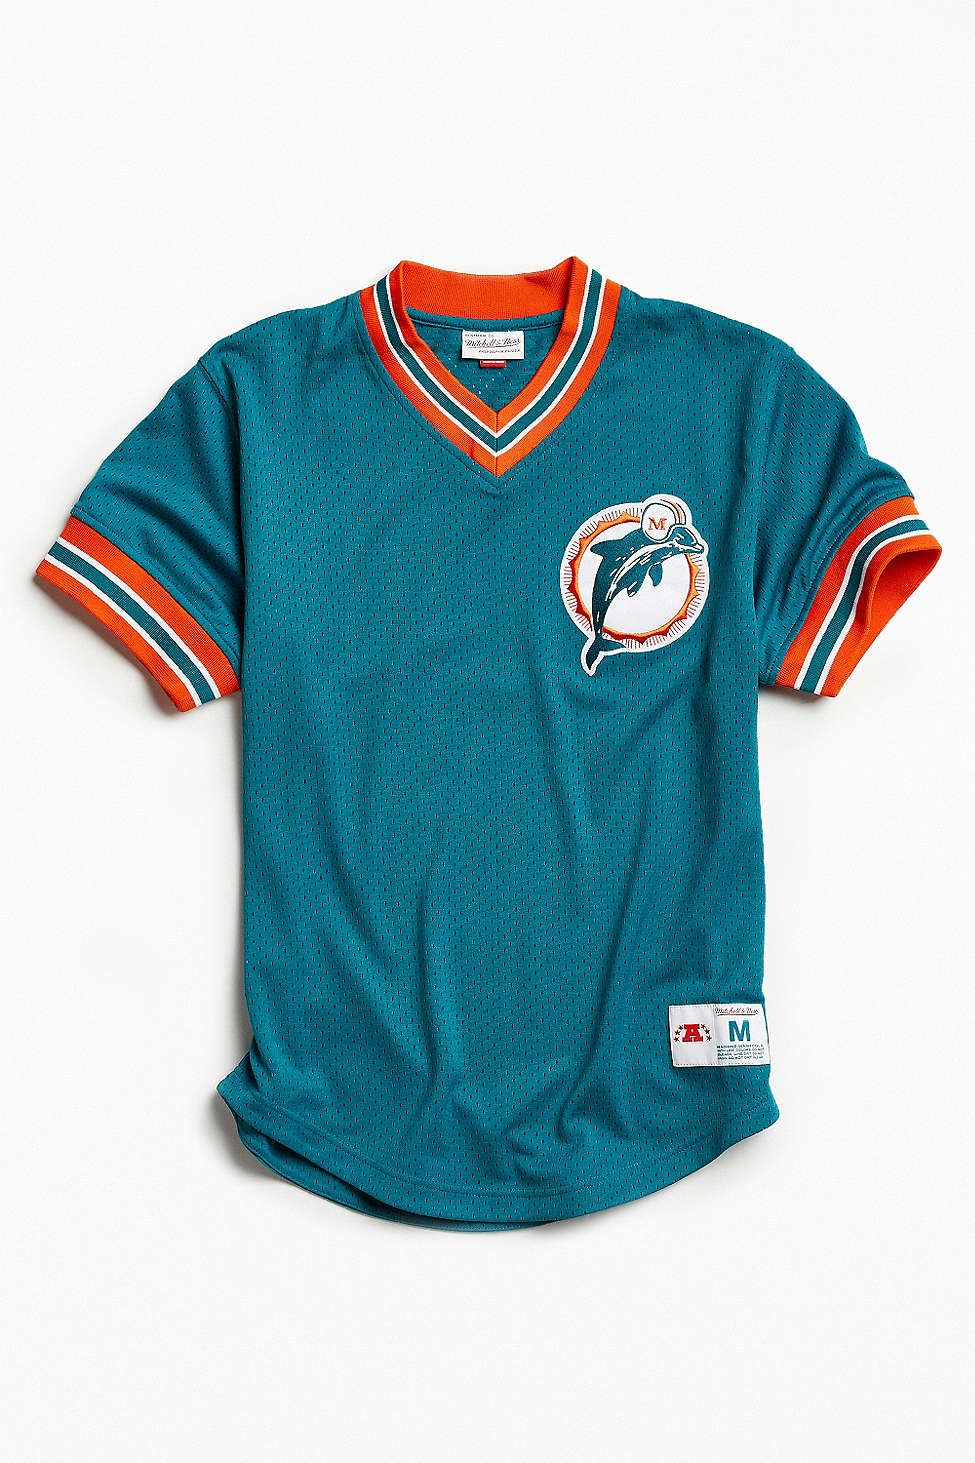 Mitchell & Ness NFL Miami Dolphins Mesh V-Neck Top